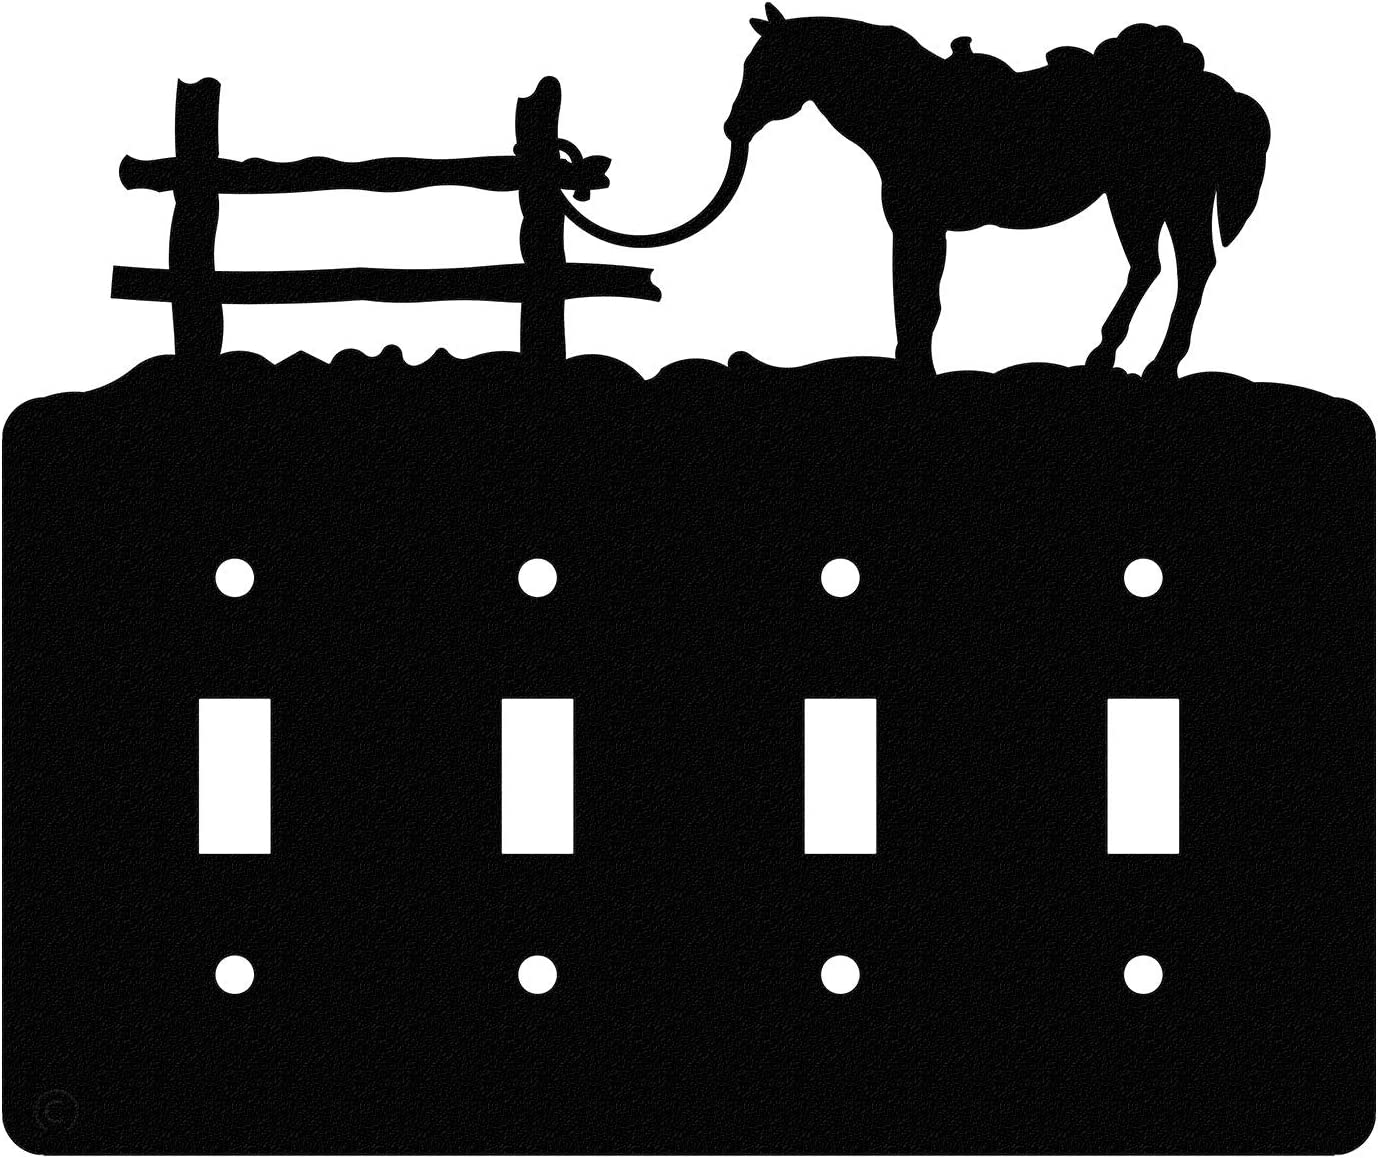 Innovative Fabricators, Inc. Tethered Horse Quadruple Toggle Light Switch Wall Plate